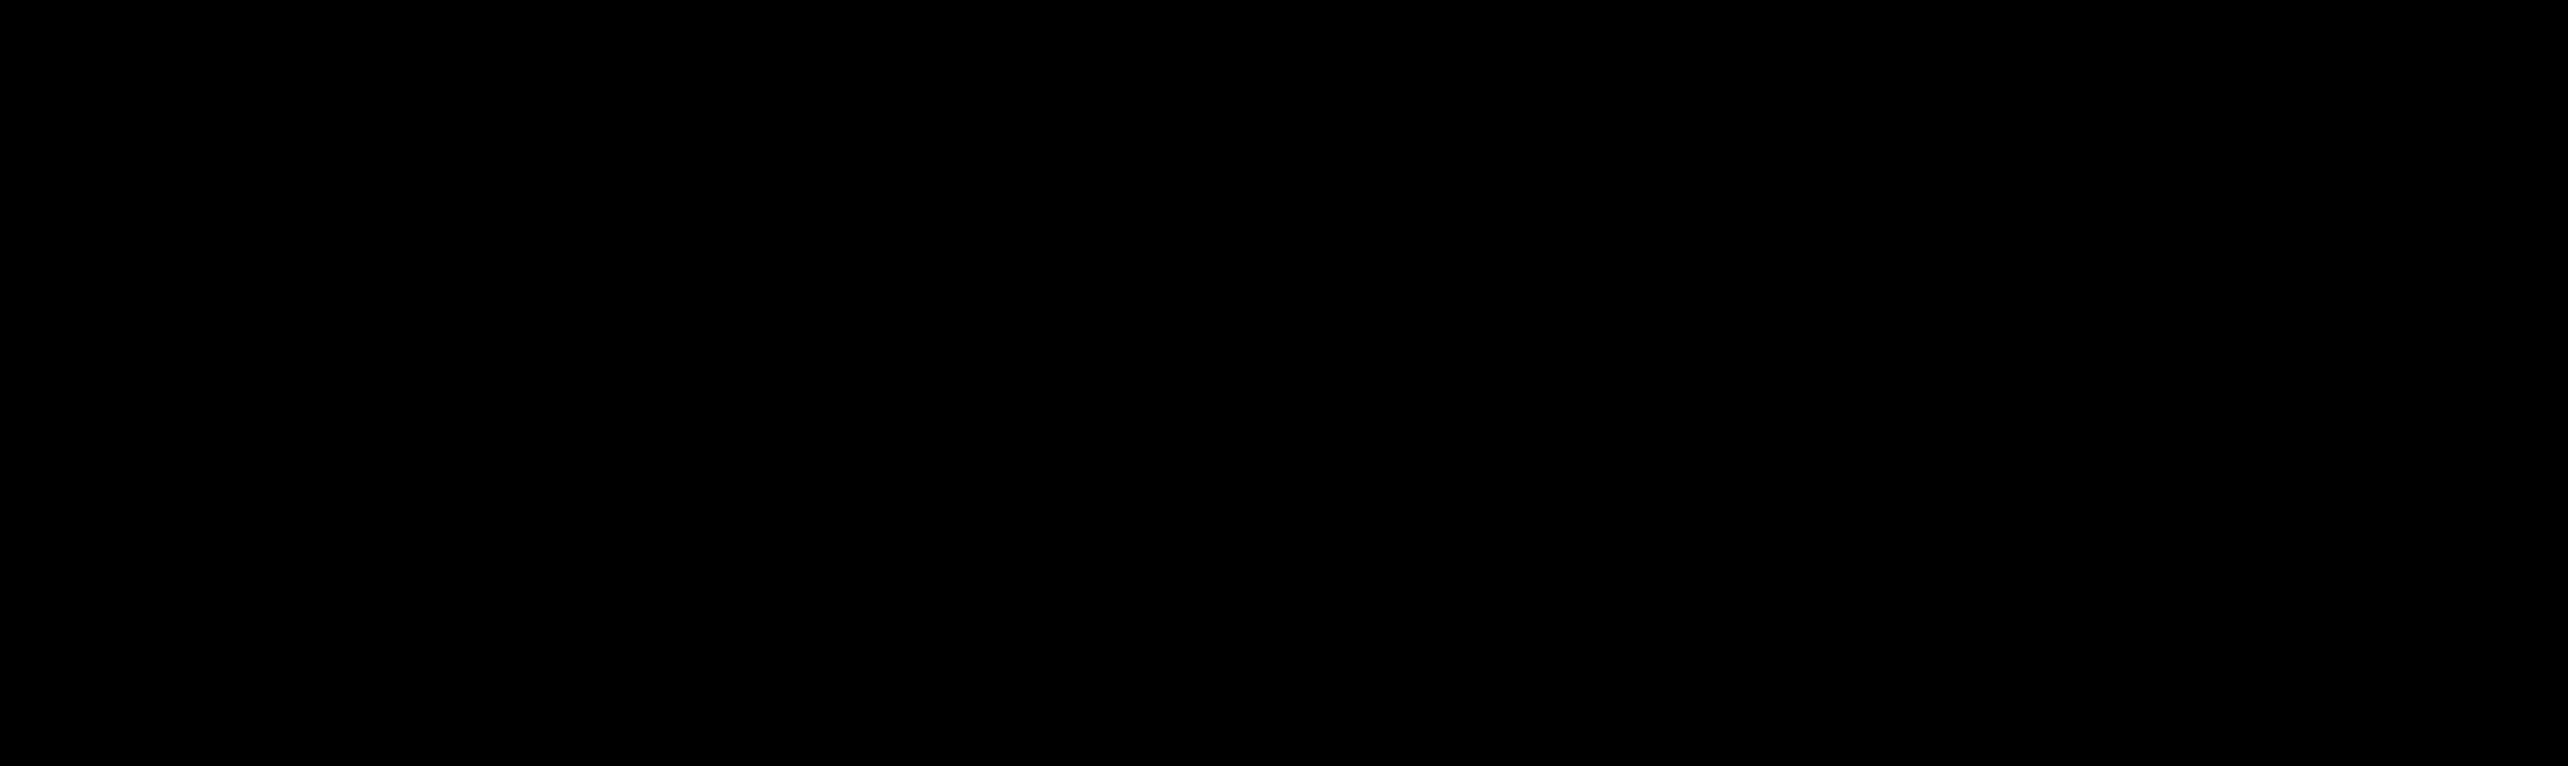 Aplysamine 6